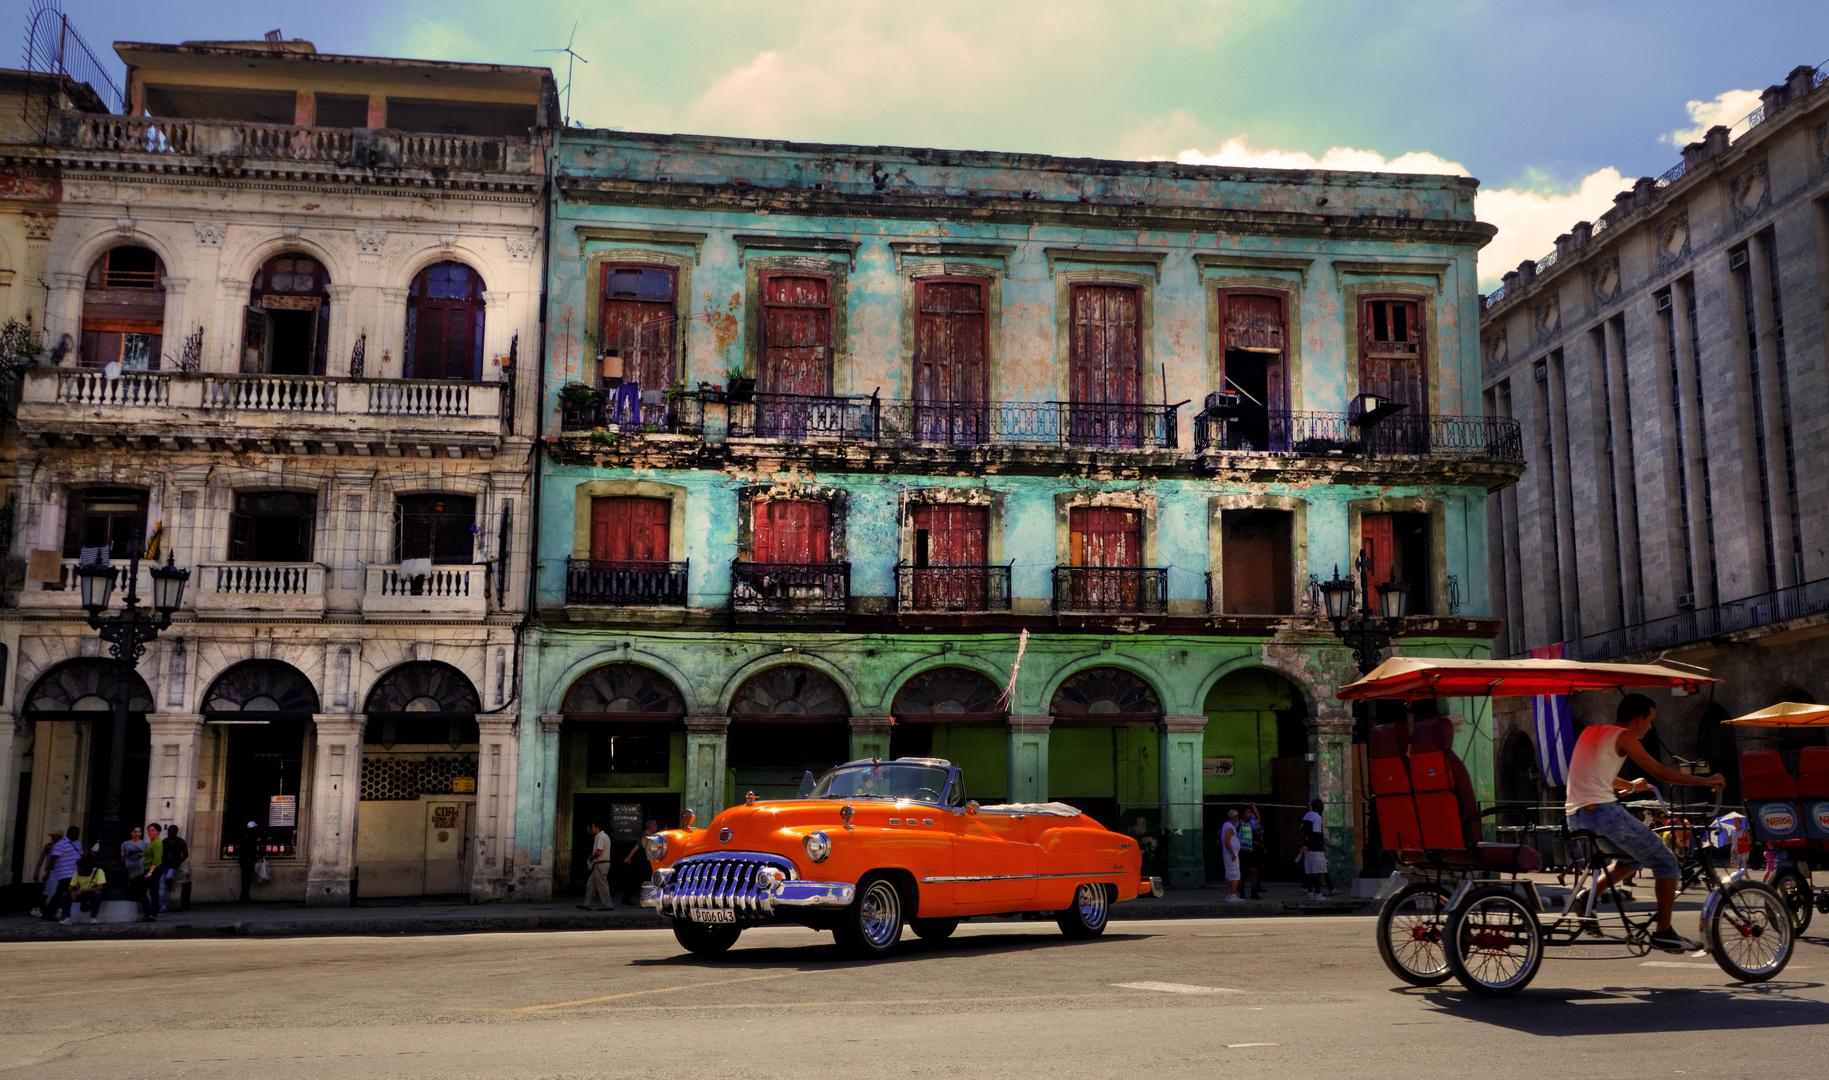 Welcome to Havanna